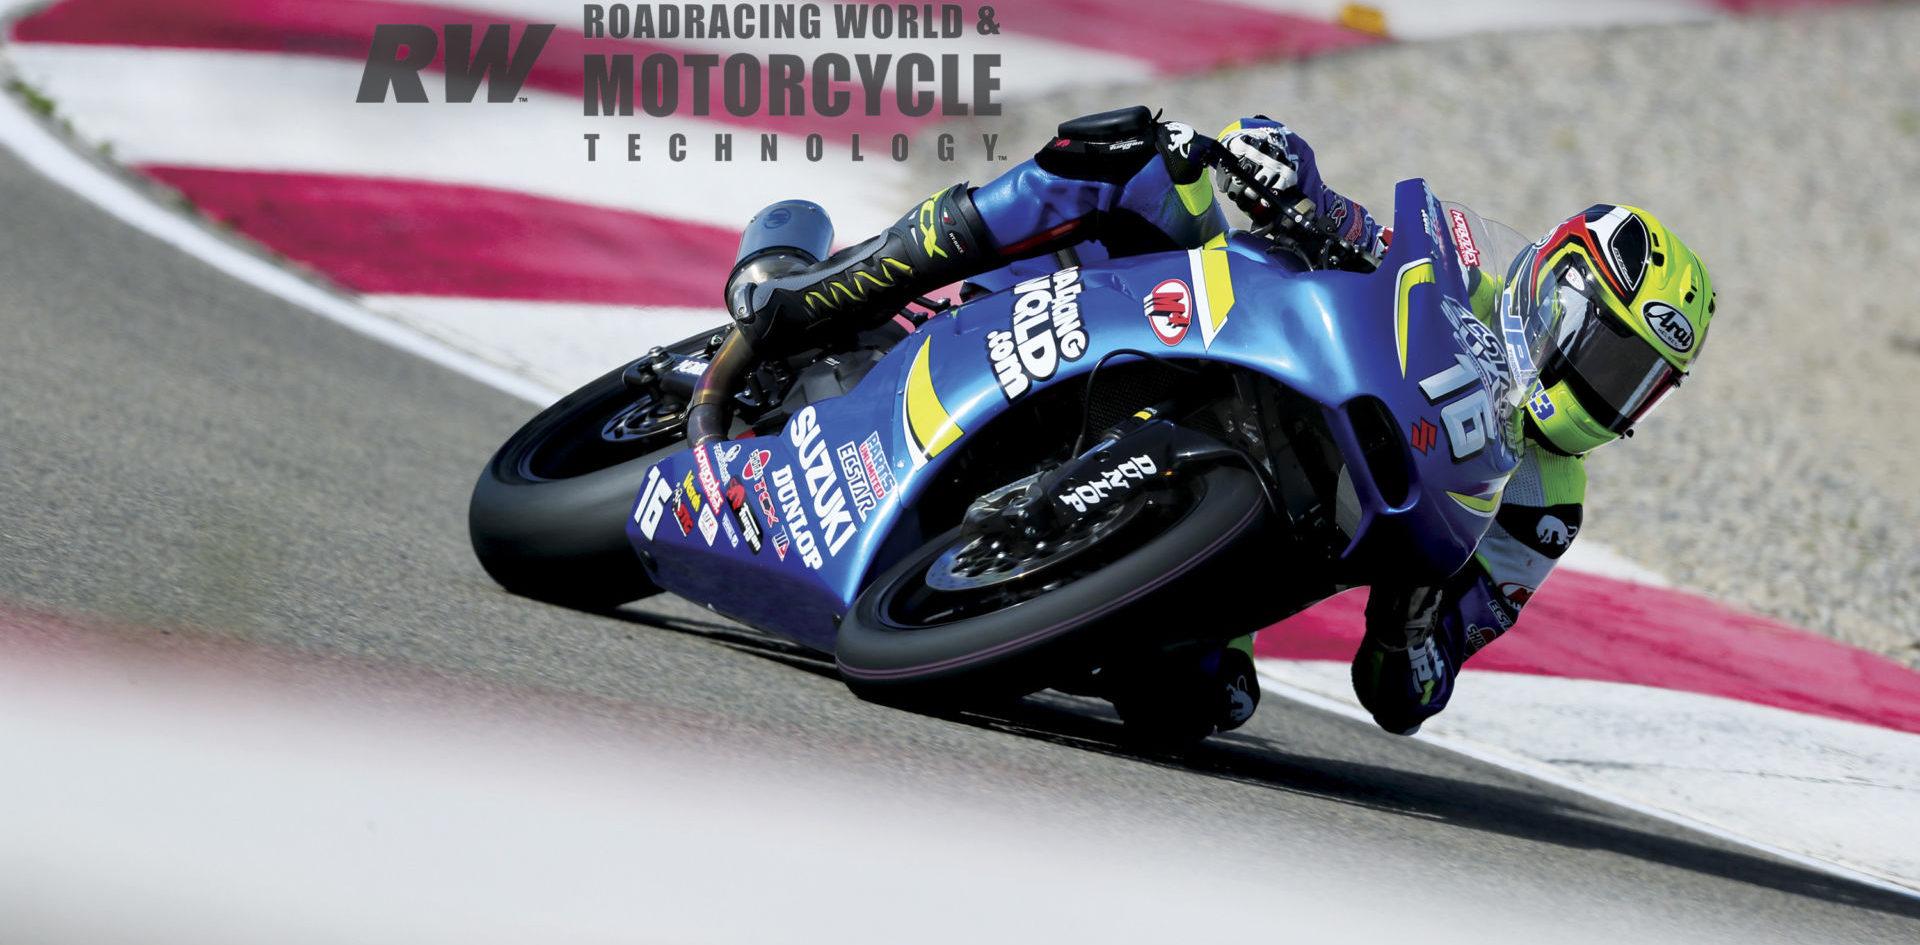 Suzuki Sv650 Project Building A Motoamerica Winner Part 4 July Issue Roadracing World Magazine Motorcycle Riding Racing Tech News